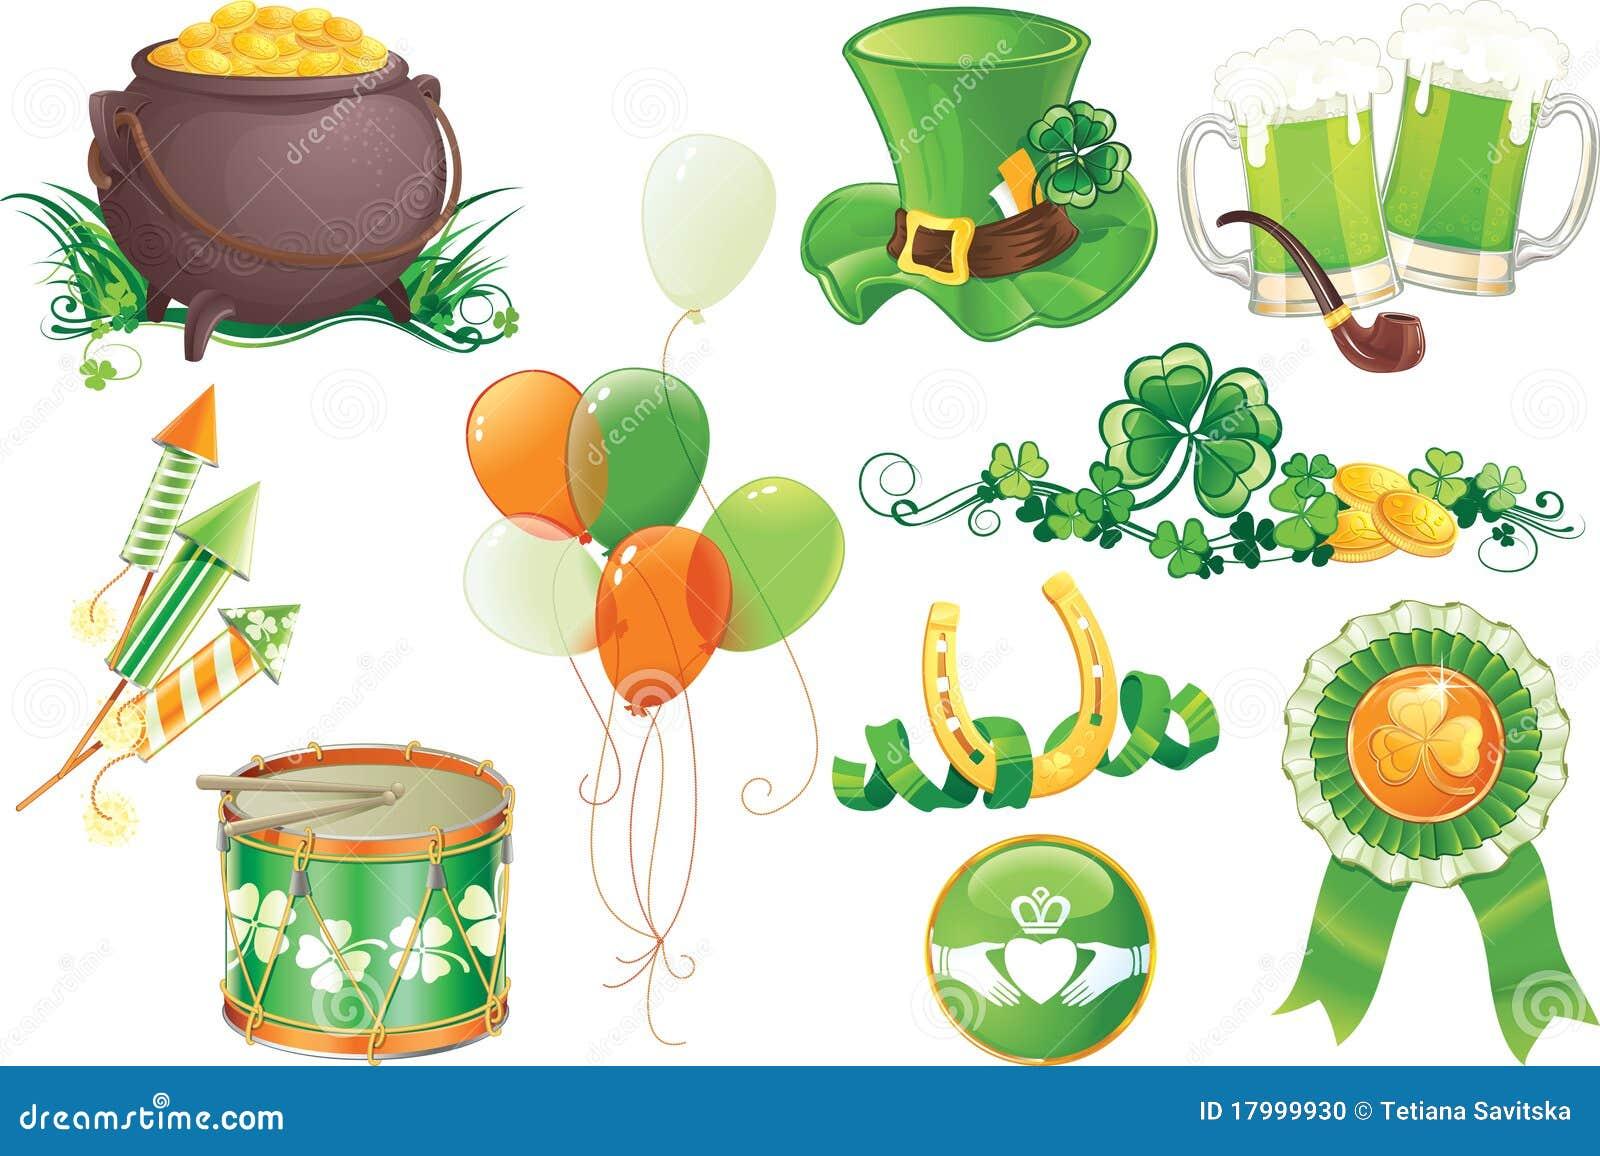 StPatricks Day Symbols Stock Photo Image 17999930